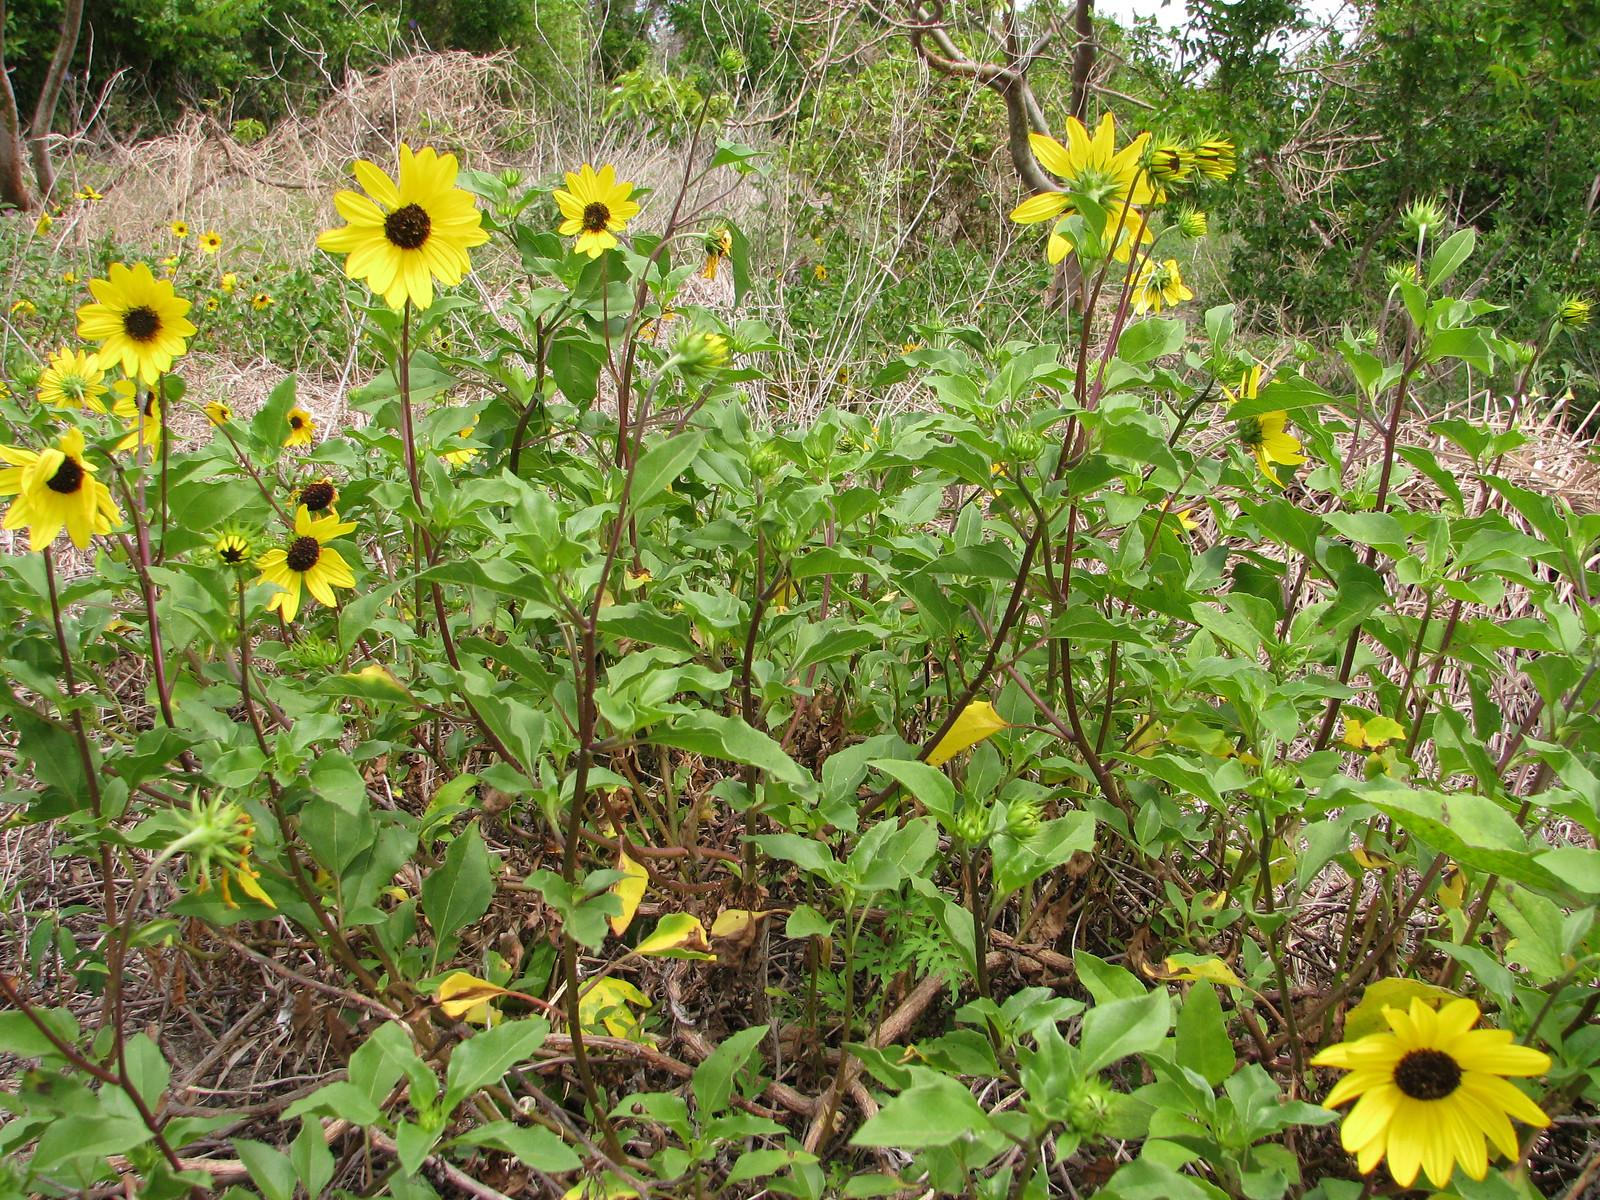 Beach Sunflower (Helianthus debilis)